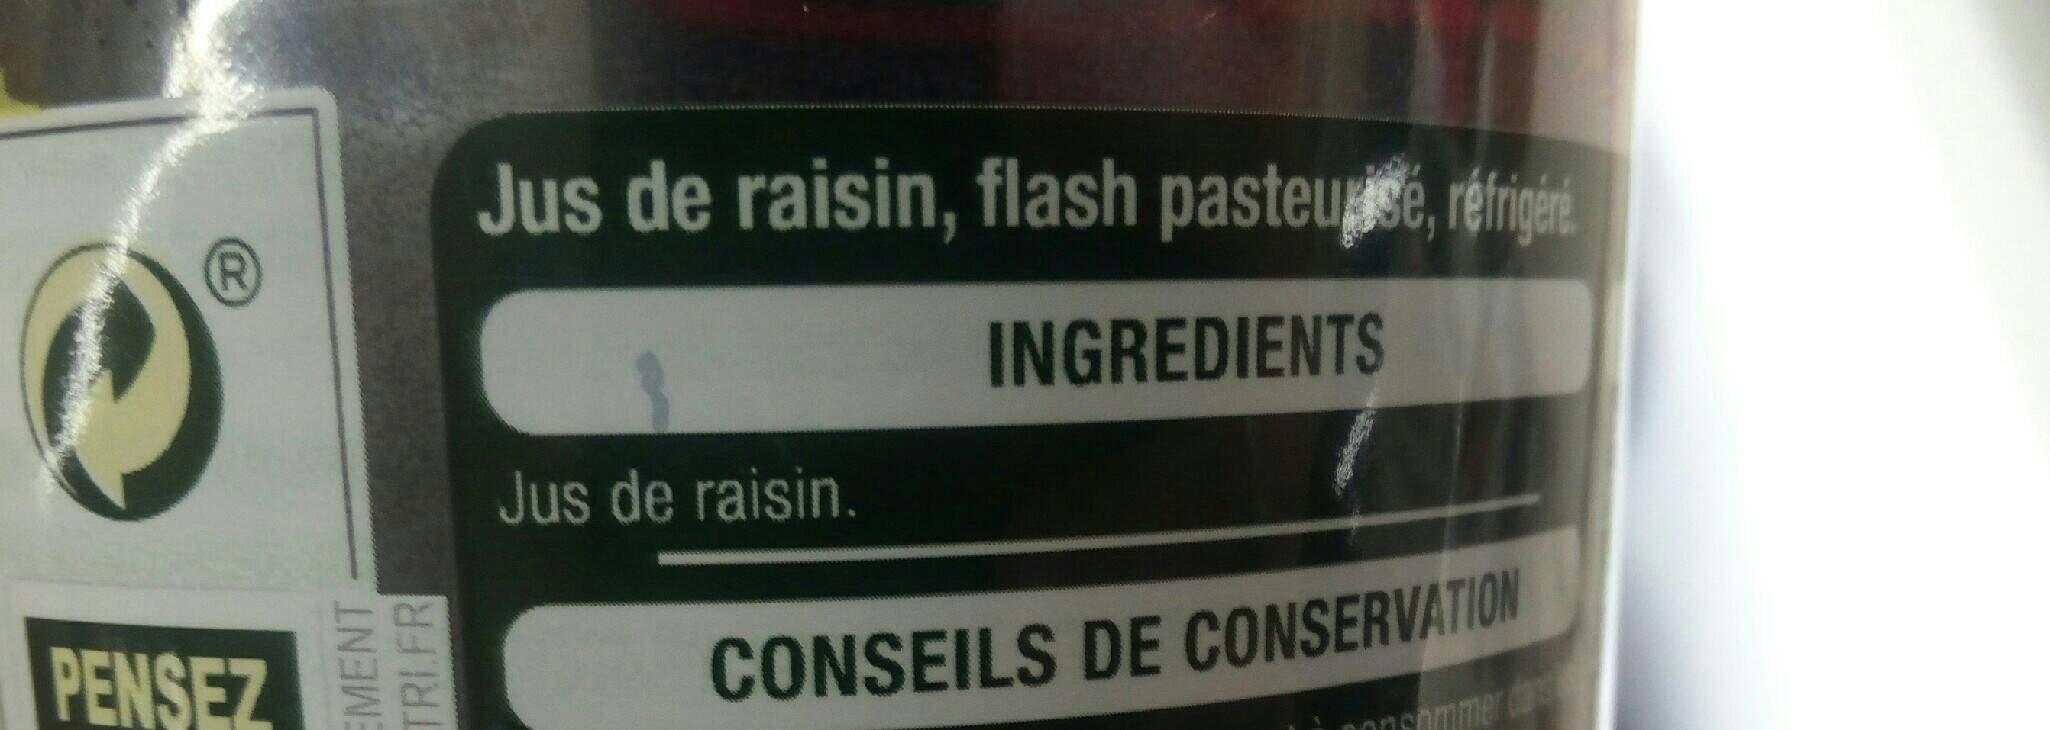 100% Jus raisin - Ingredienti - fr